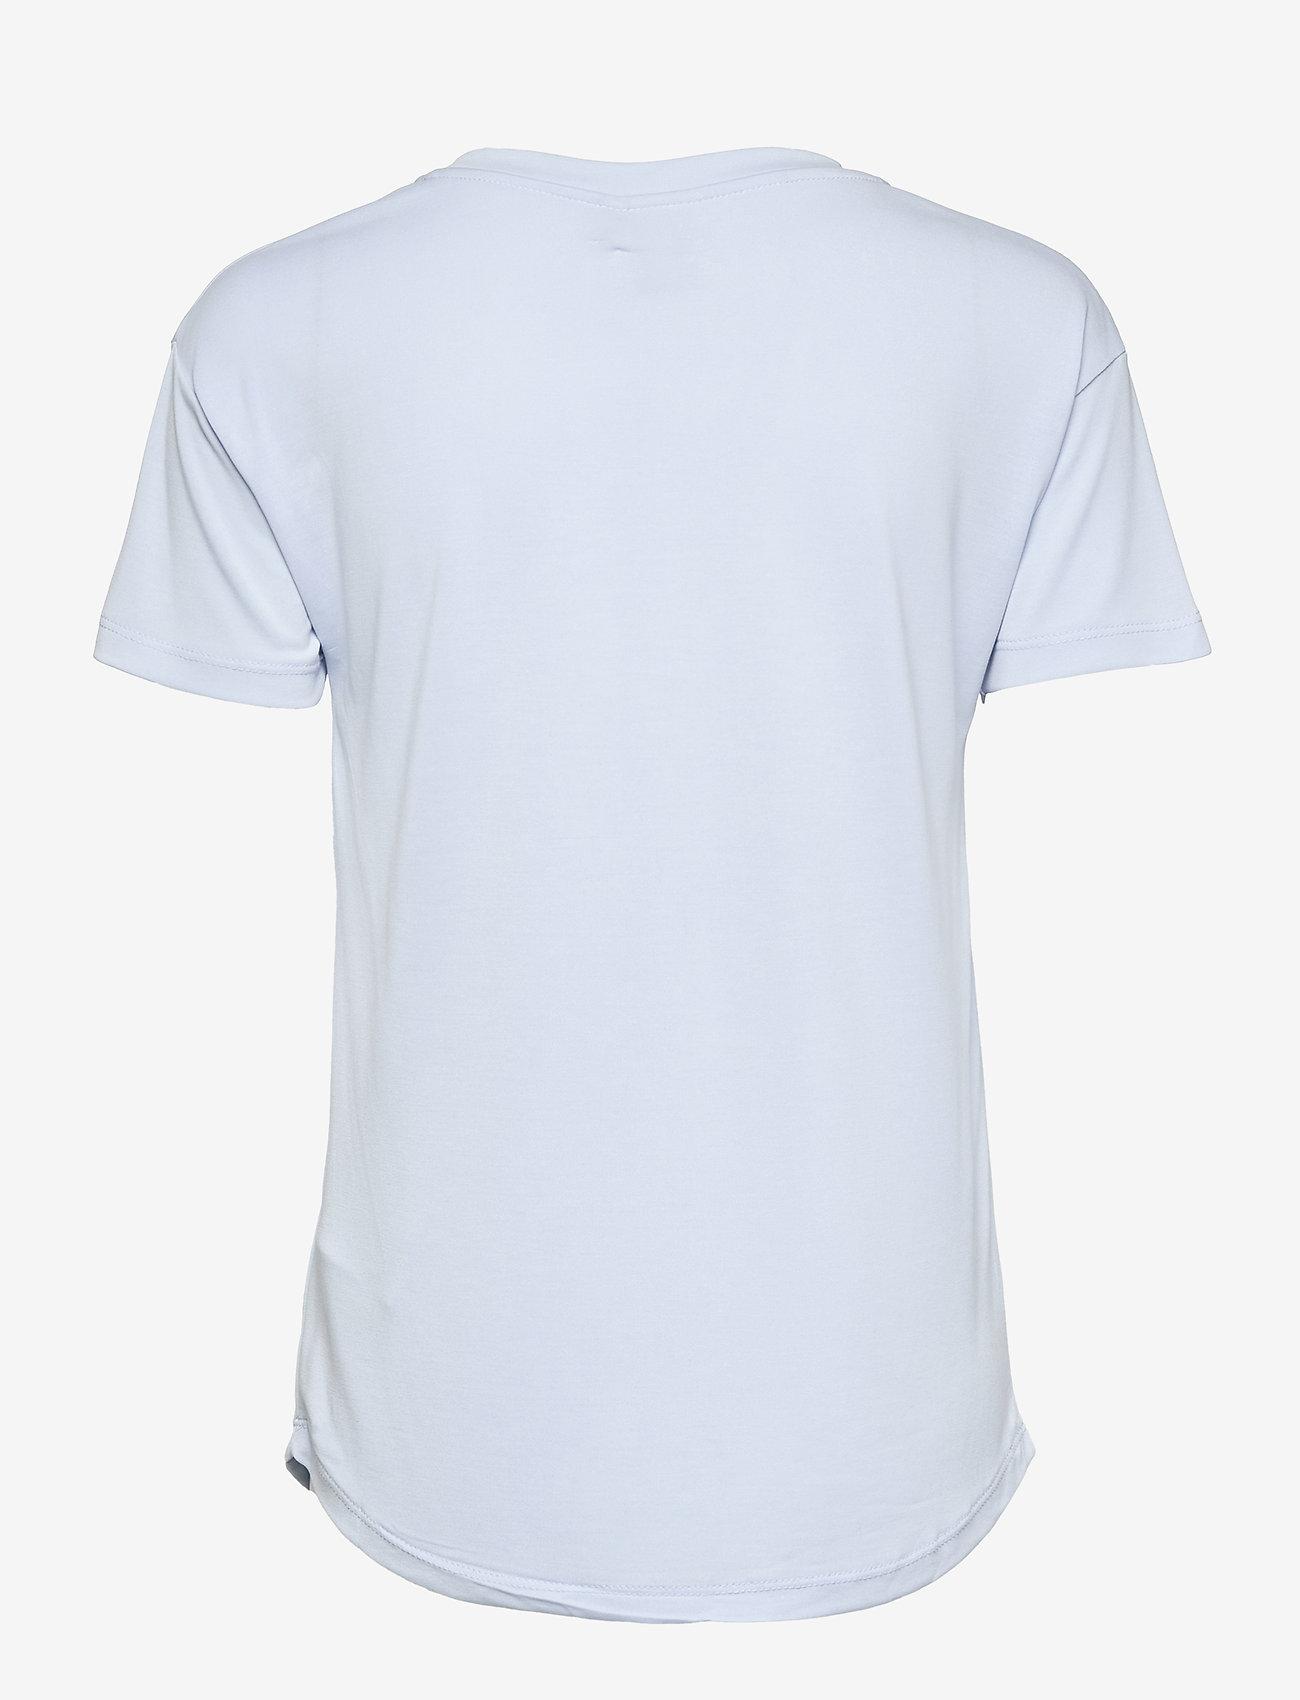 ICHI - IHSELMA SS - t-shirt & tops - cashmere blue - 1